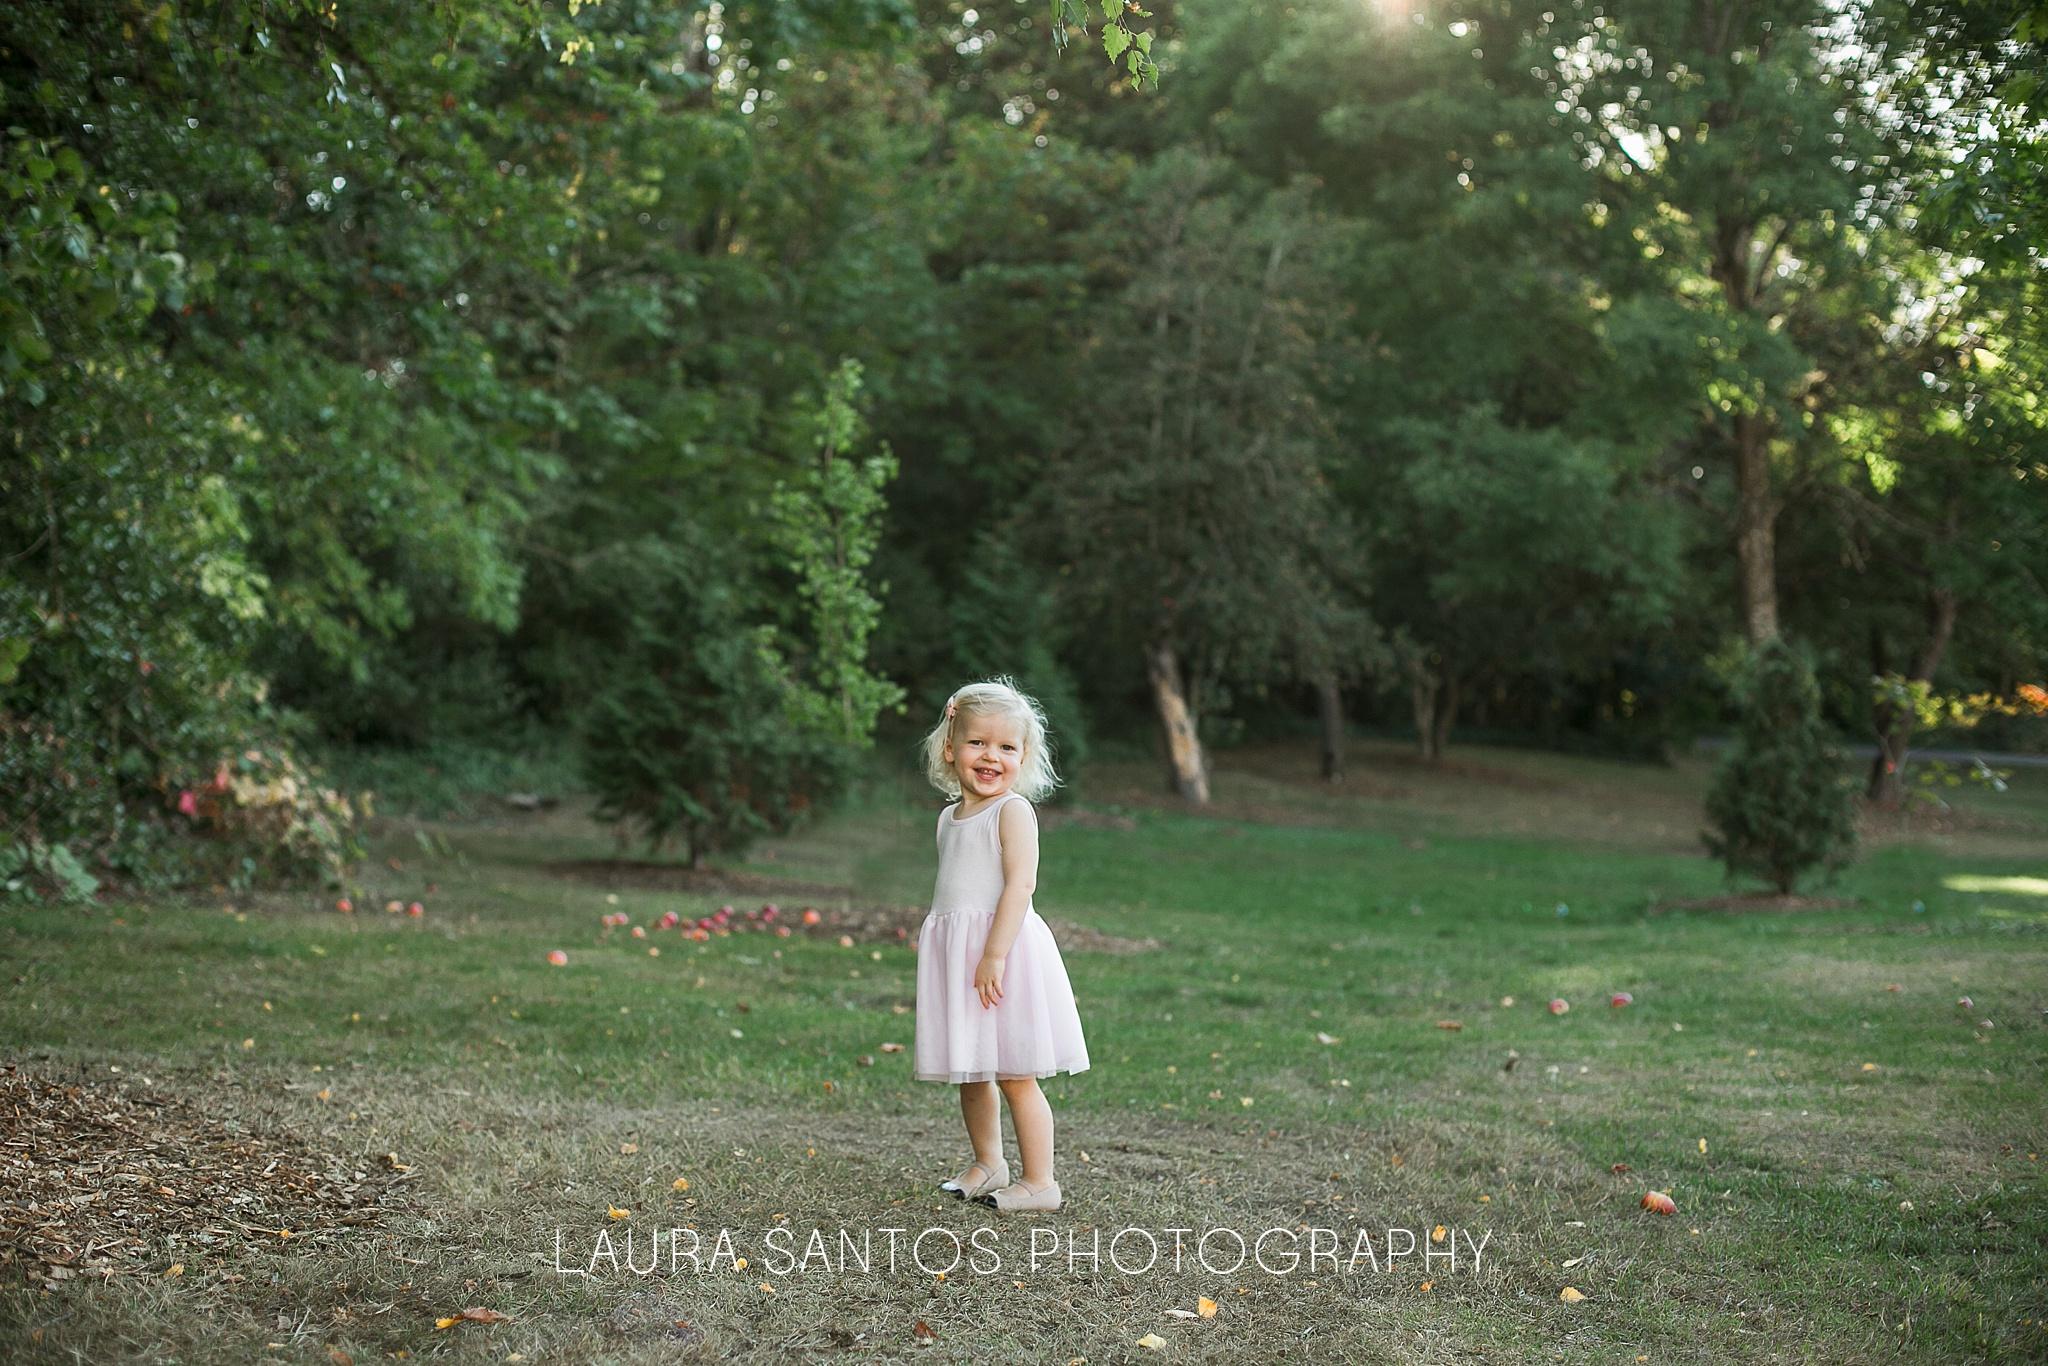 Laura Santos Photography Portland Oregon Family Photographer_0737.jpg